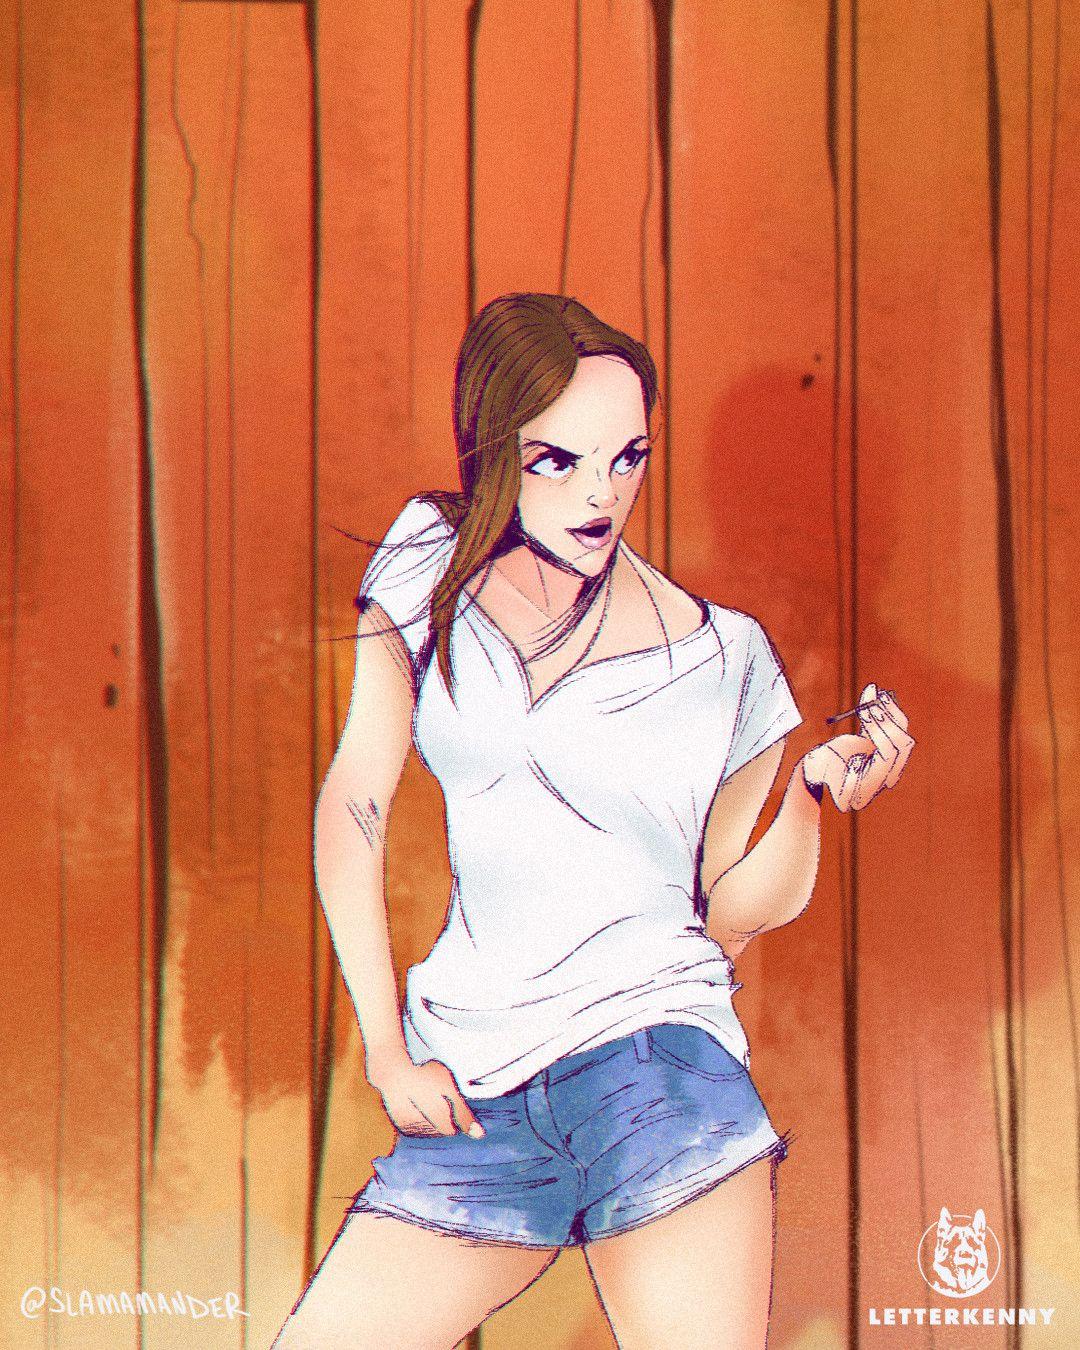 Letterkenny Animated Katy By Rudy Slama Slamamander Letterkenny Animation Katy